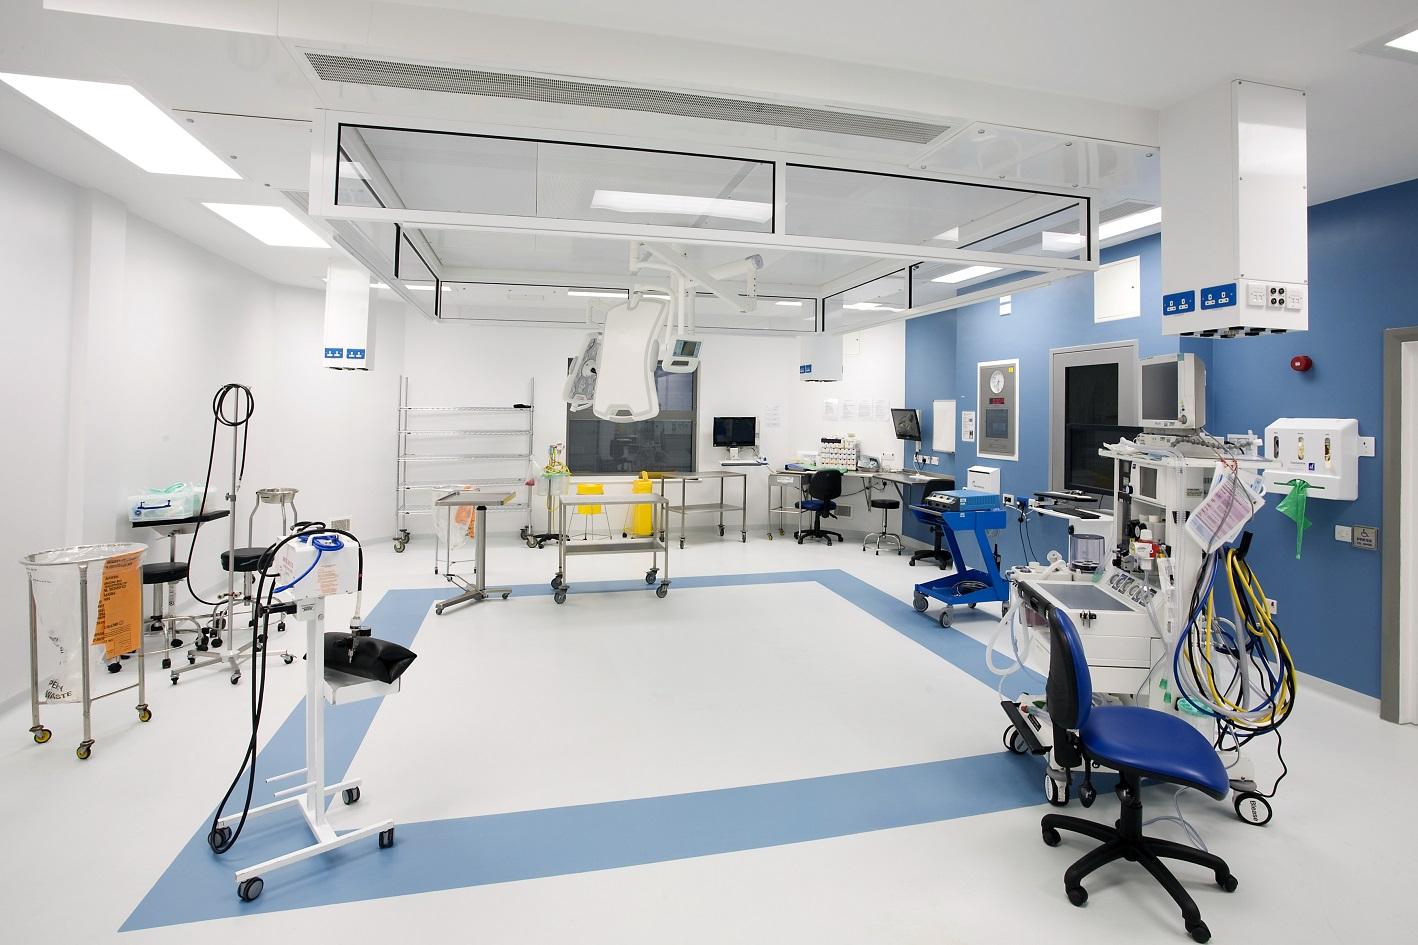 Hospital 1